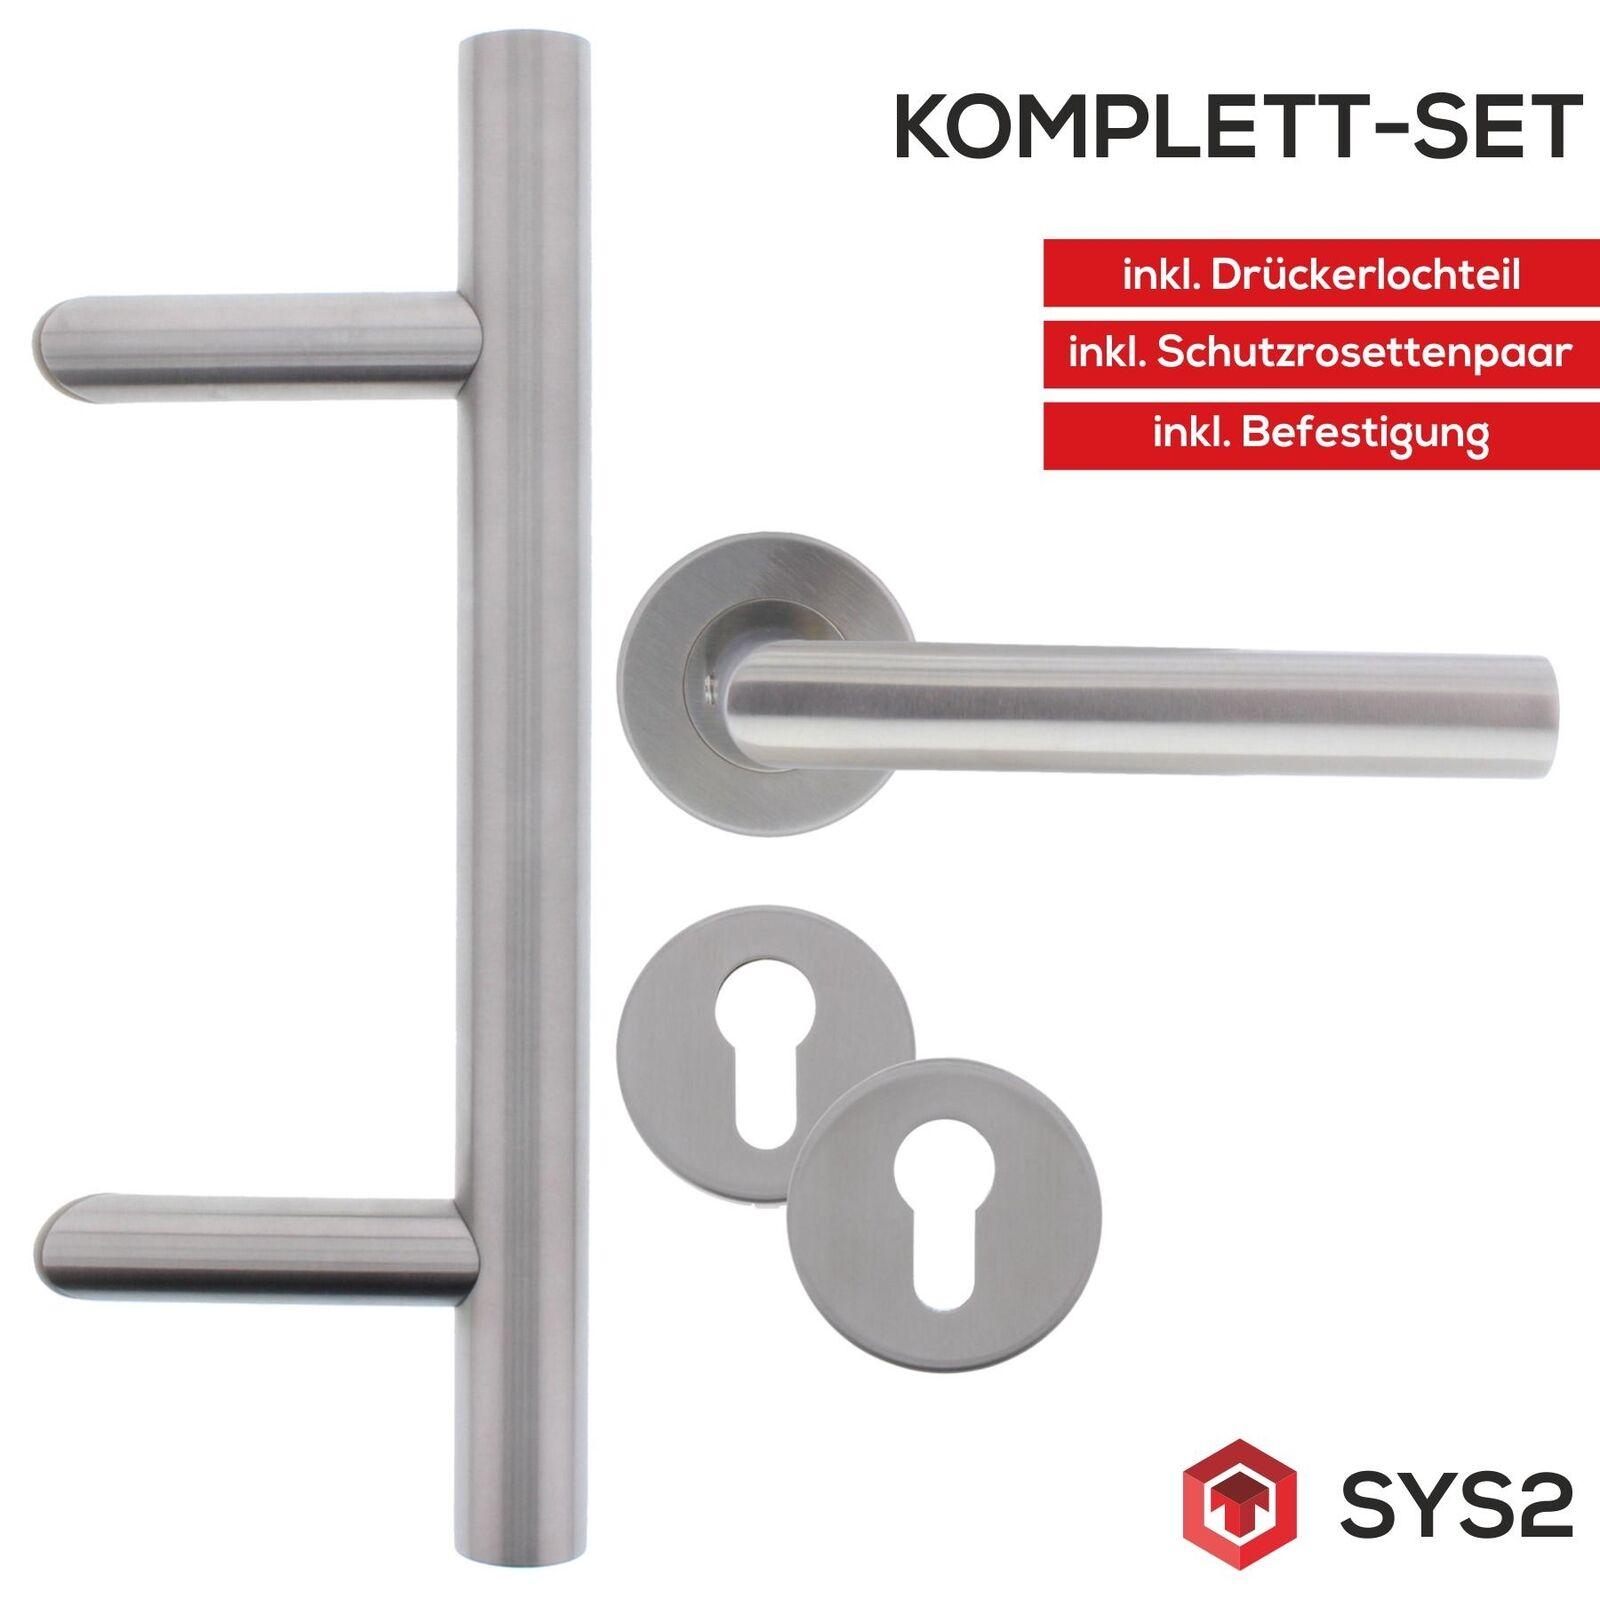 ToniTec® Türgriff Stoßgriff Set komplett schräge Ausführung runde Rosetten 350mm